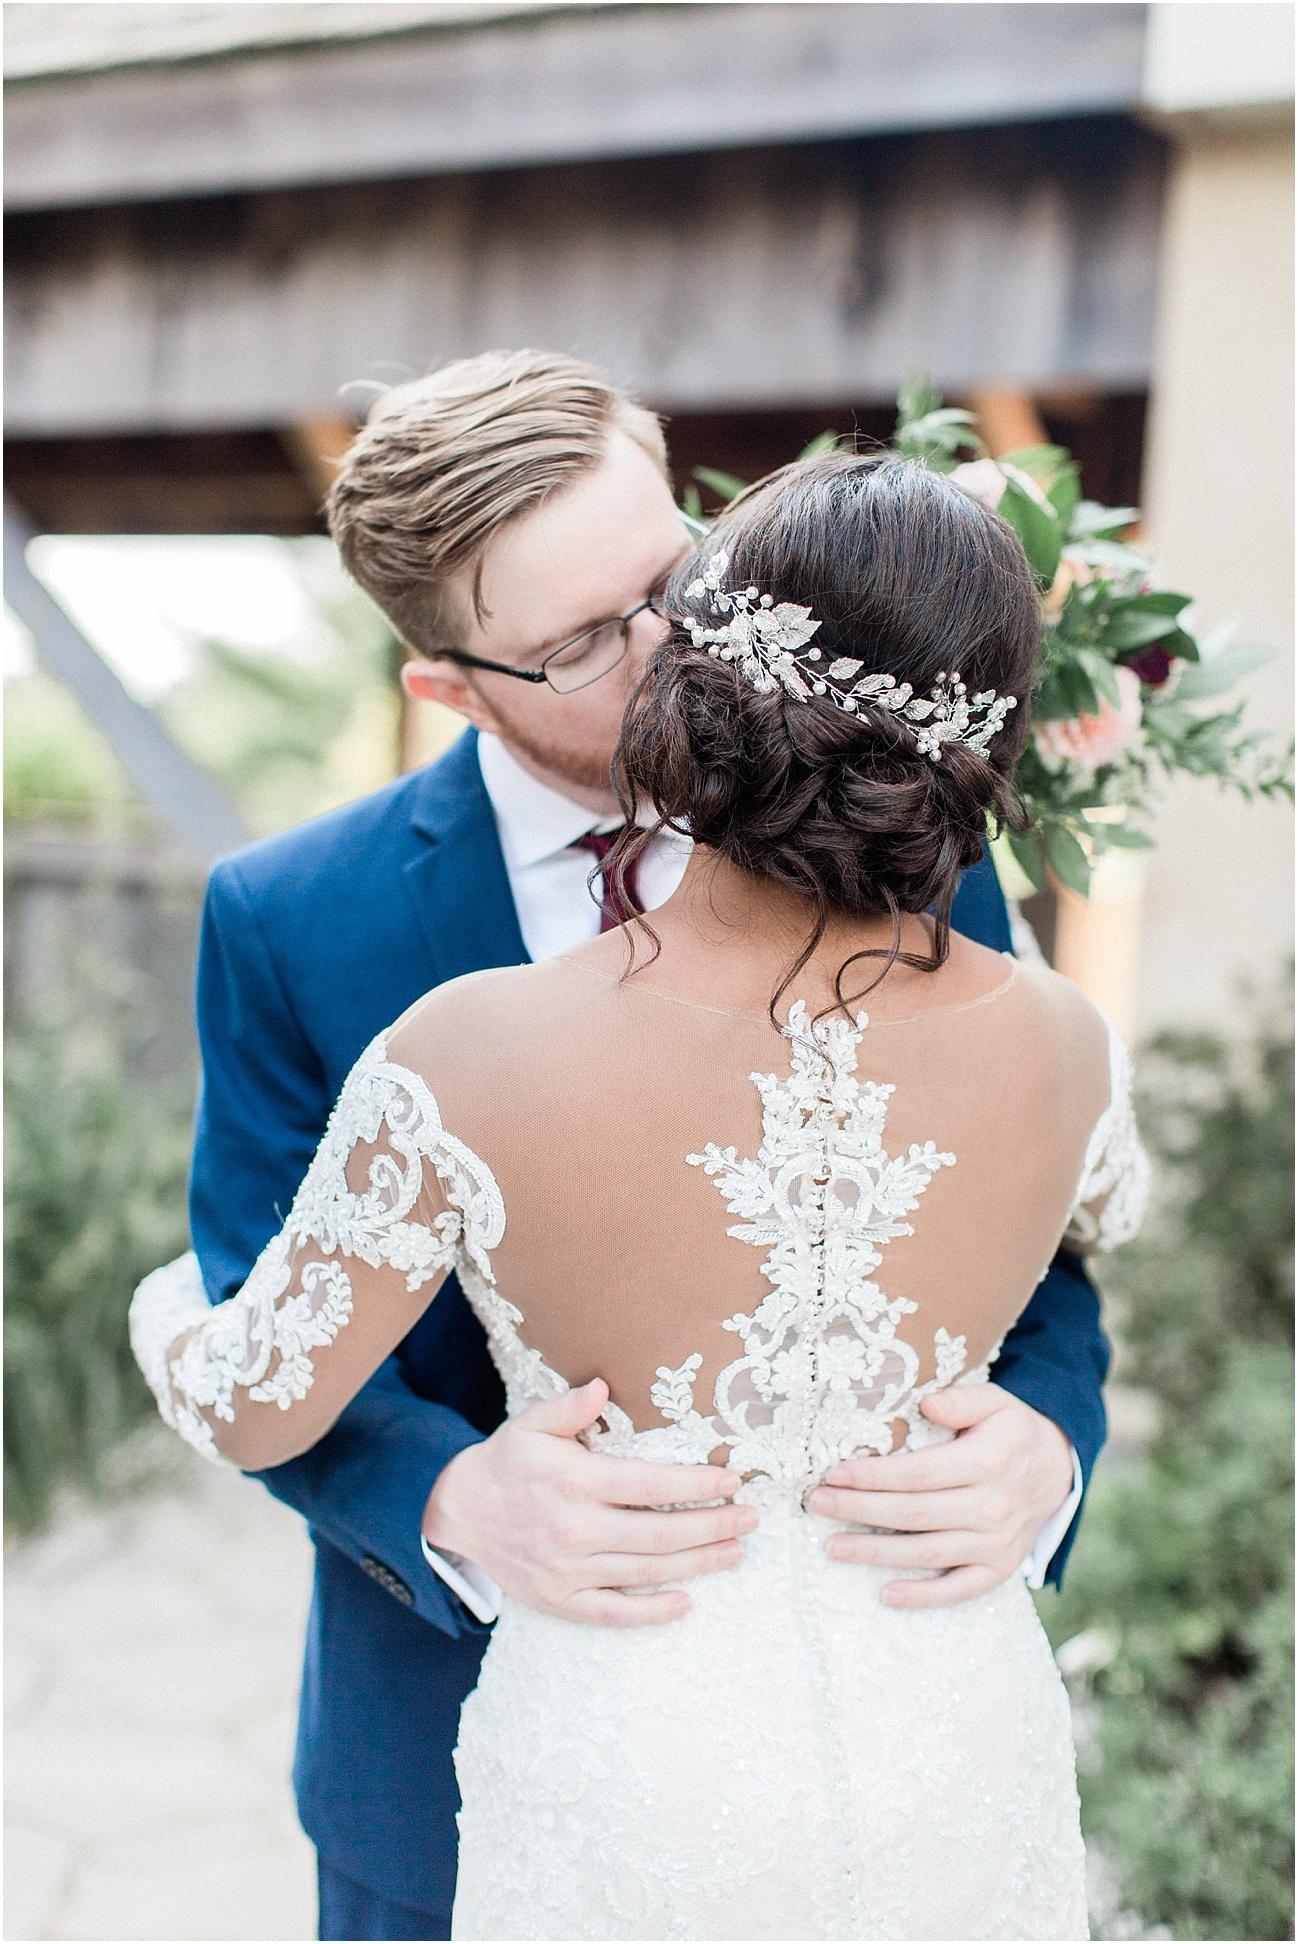 melissa_dan_the_pavilion_at_pine_hills_fall_wine_cape_cod_boston_wedding_photographer_meredith_jane_photography_photo_1181.jpg